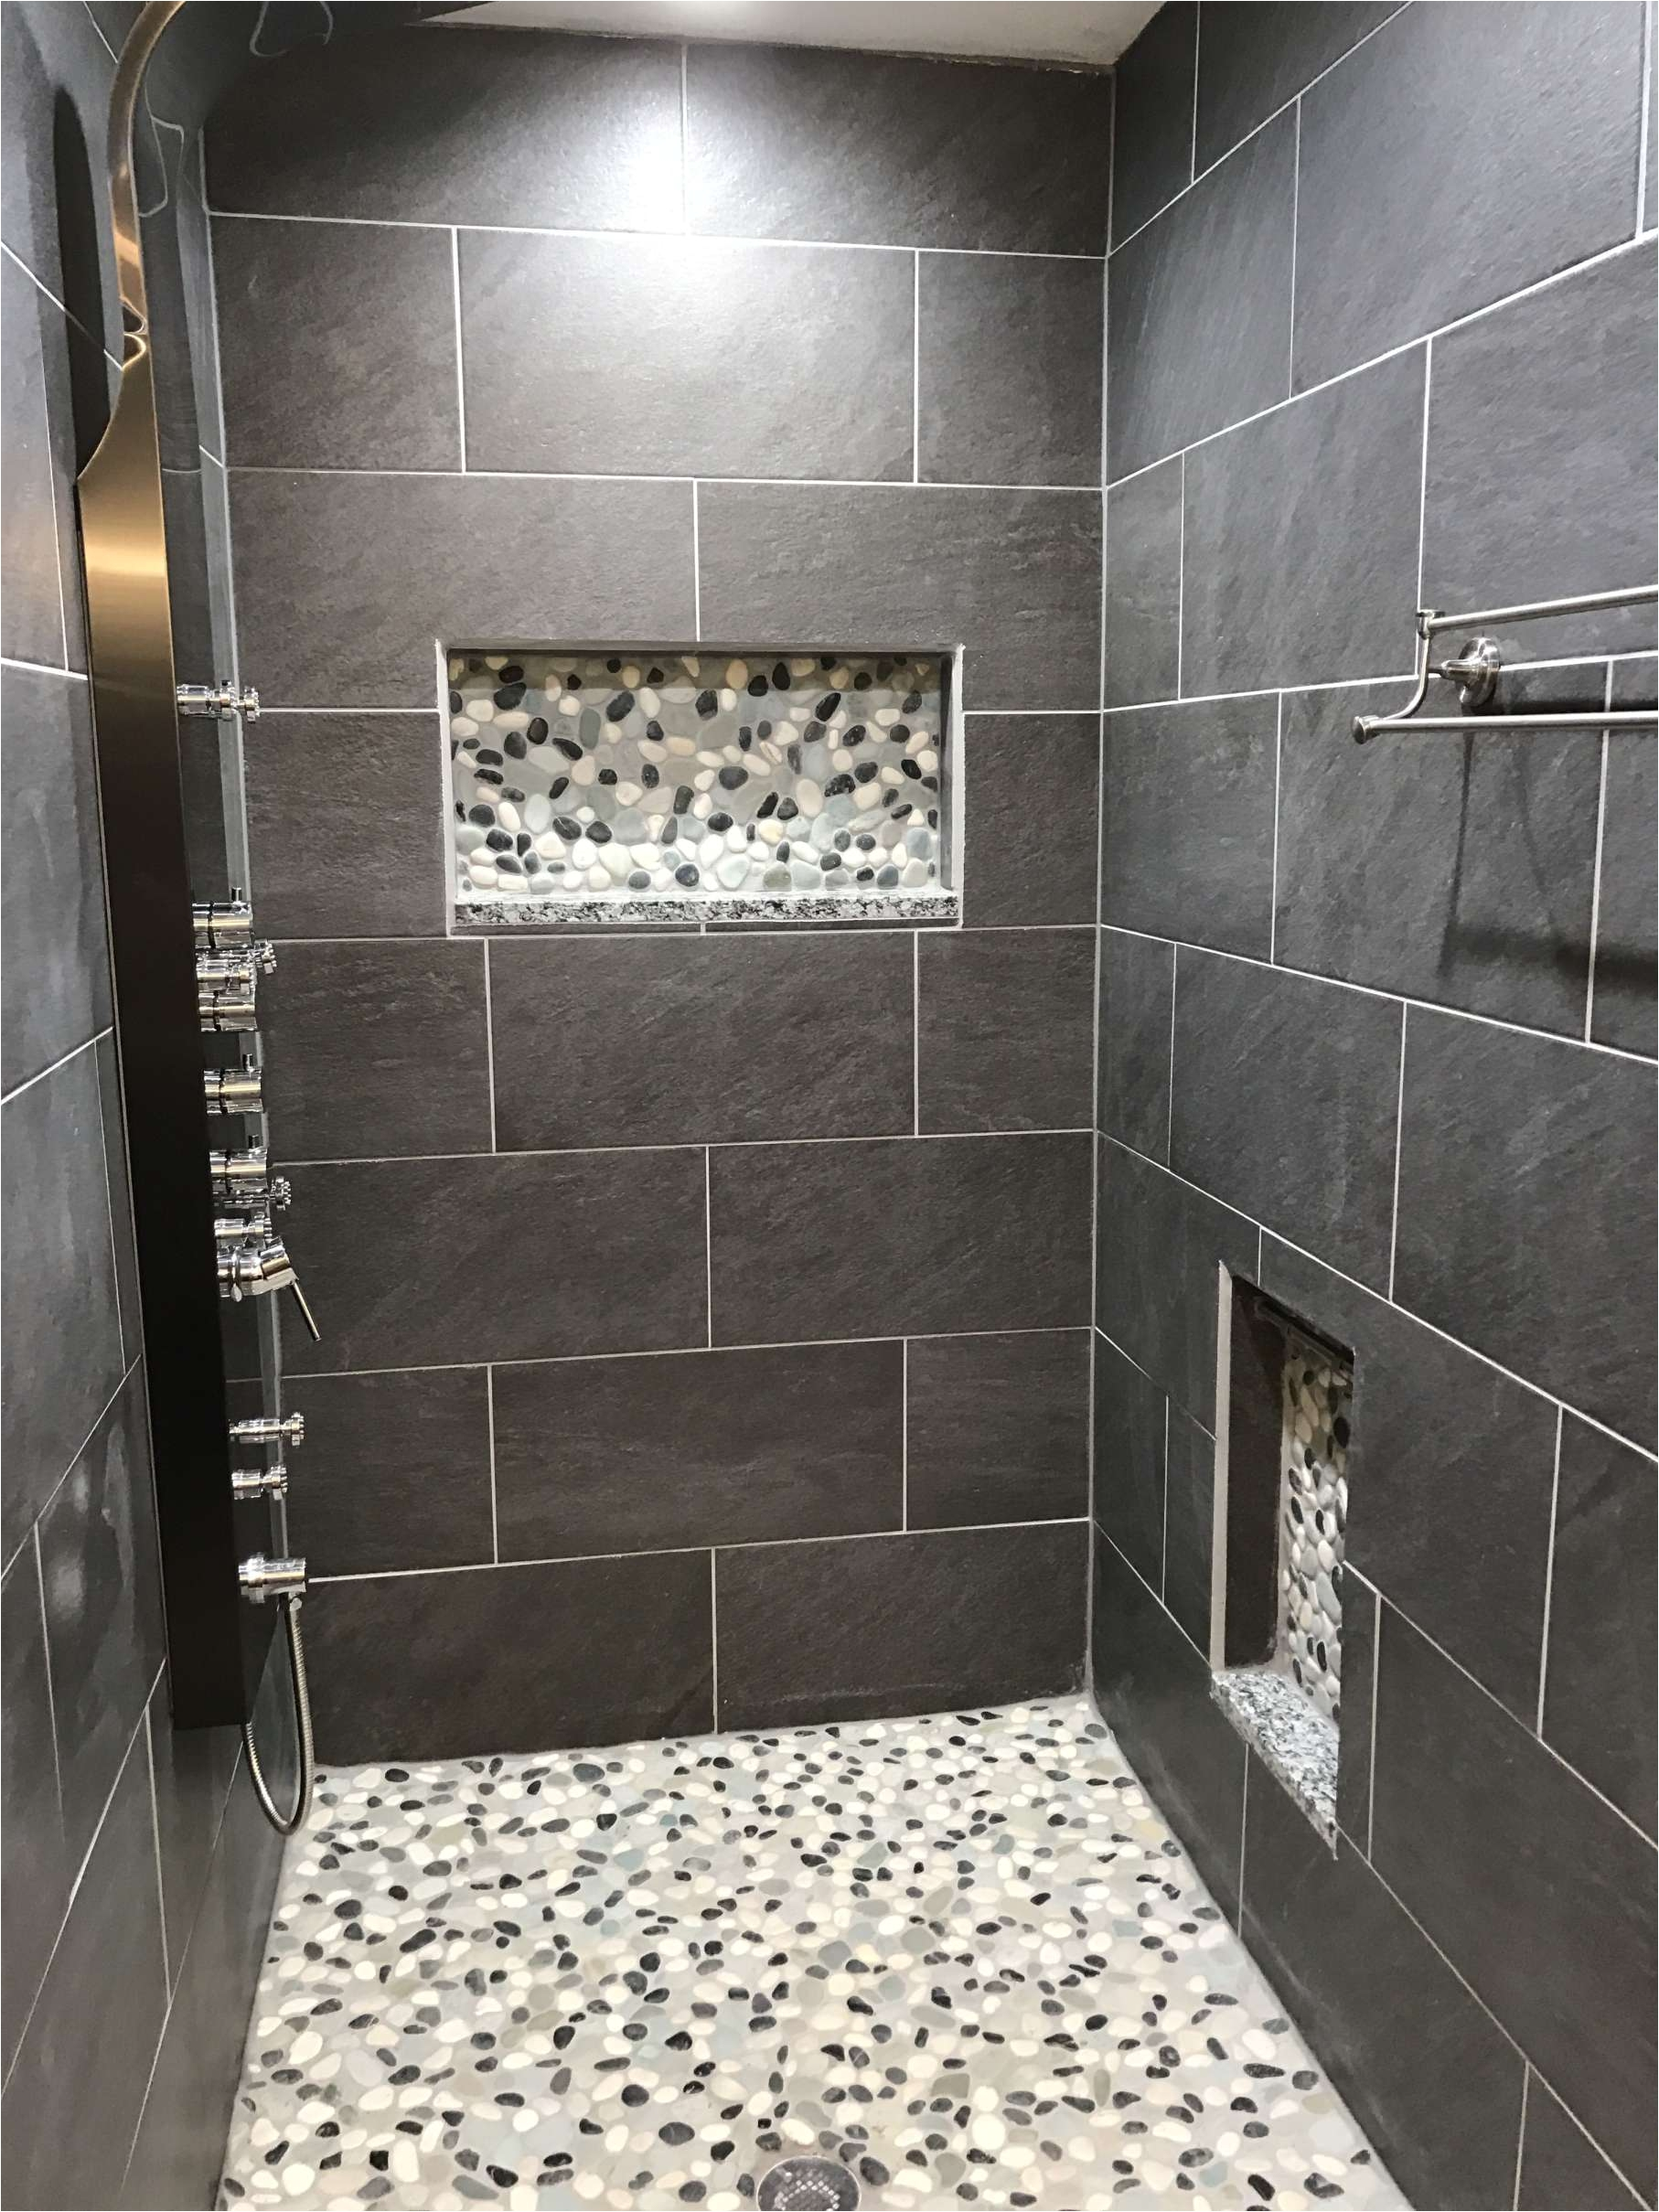 Mesmerizing Modern Bathrooms Designs with Download 47 Creative Modern Bathroom Design Ideas Uk